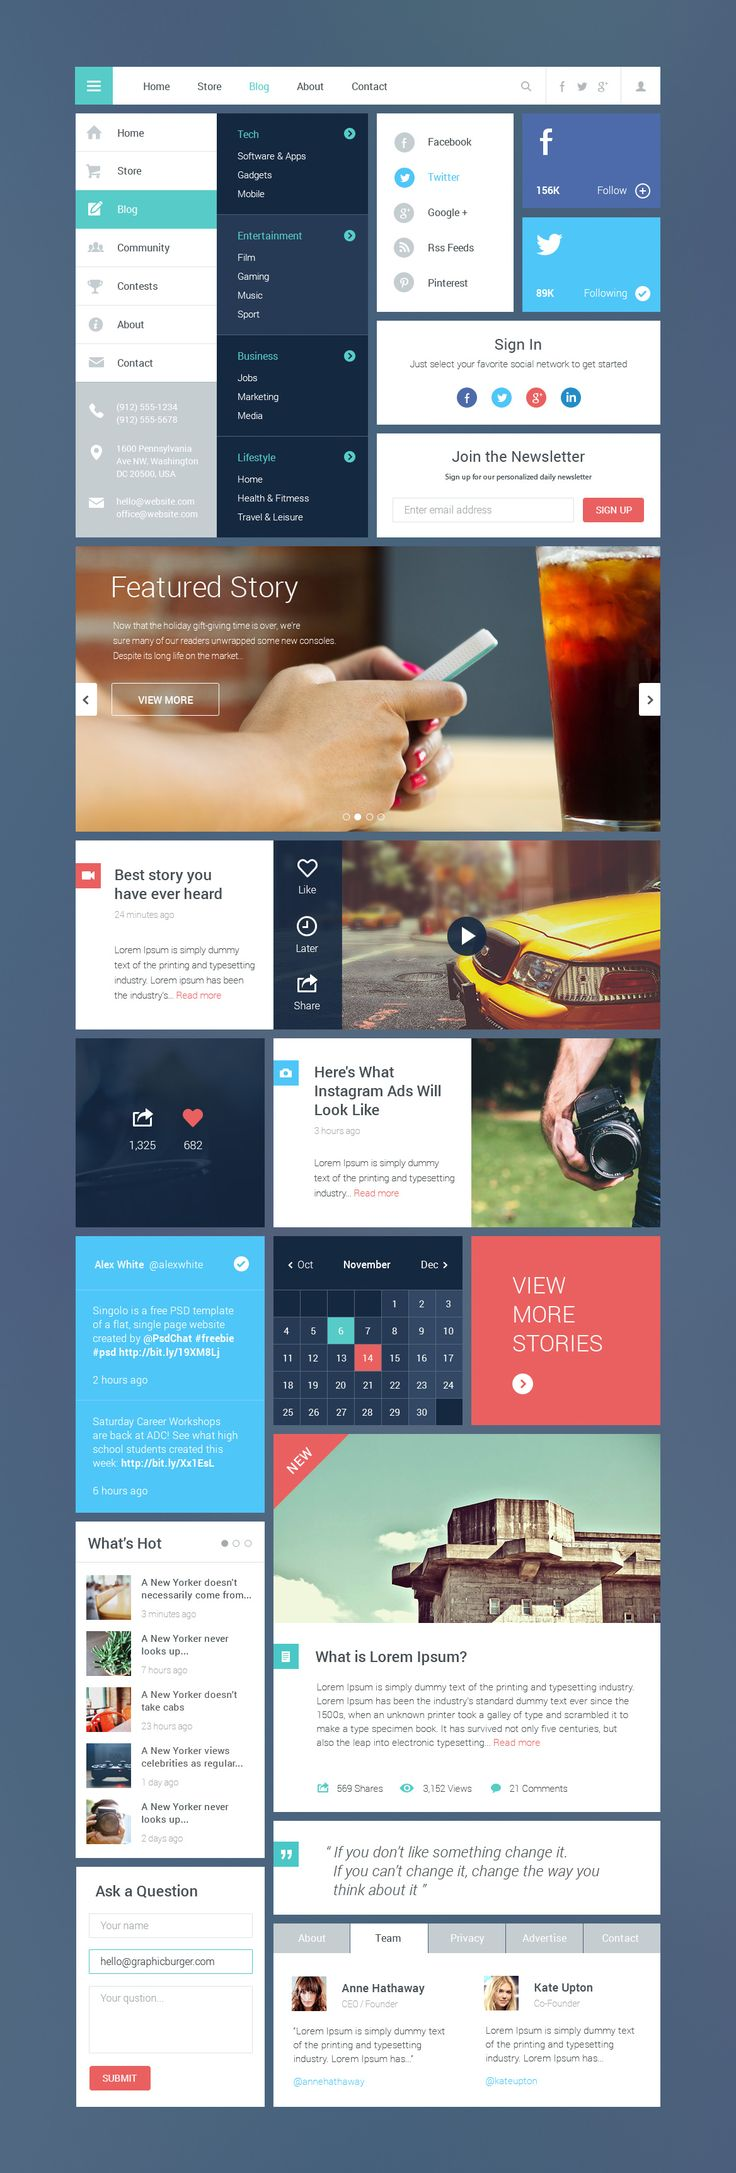 Free Blog/Magazine Flat UI Kit 2 | #webdesign #flatui #uikit